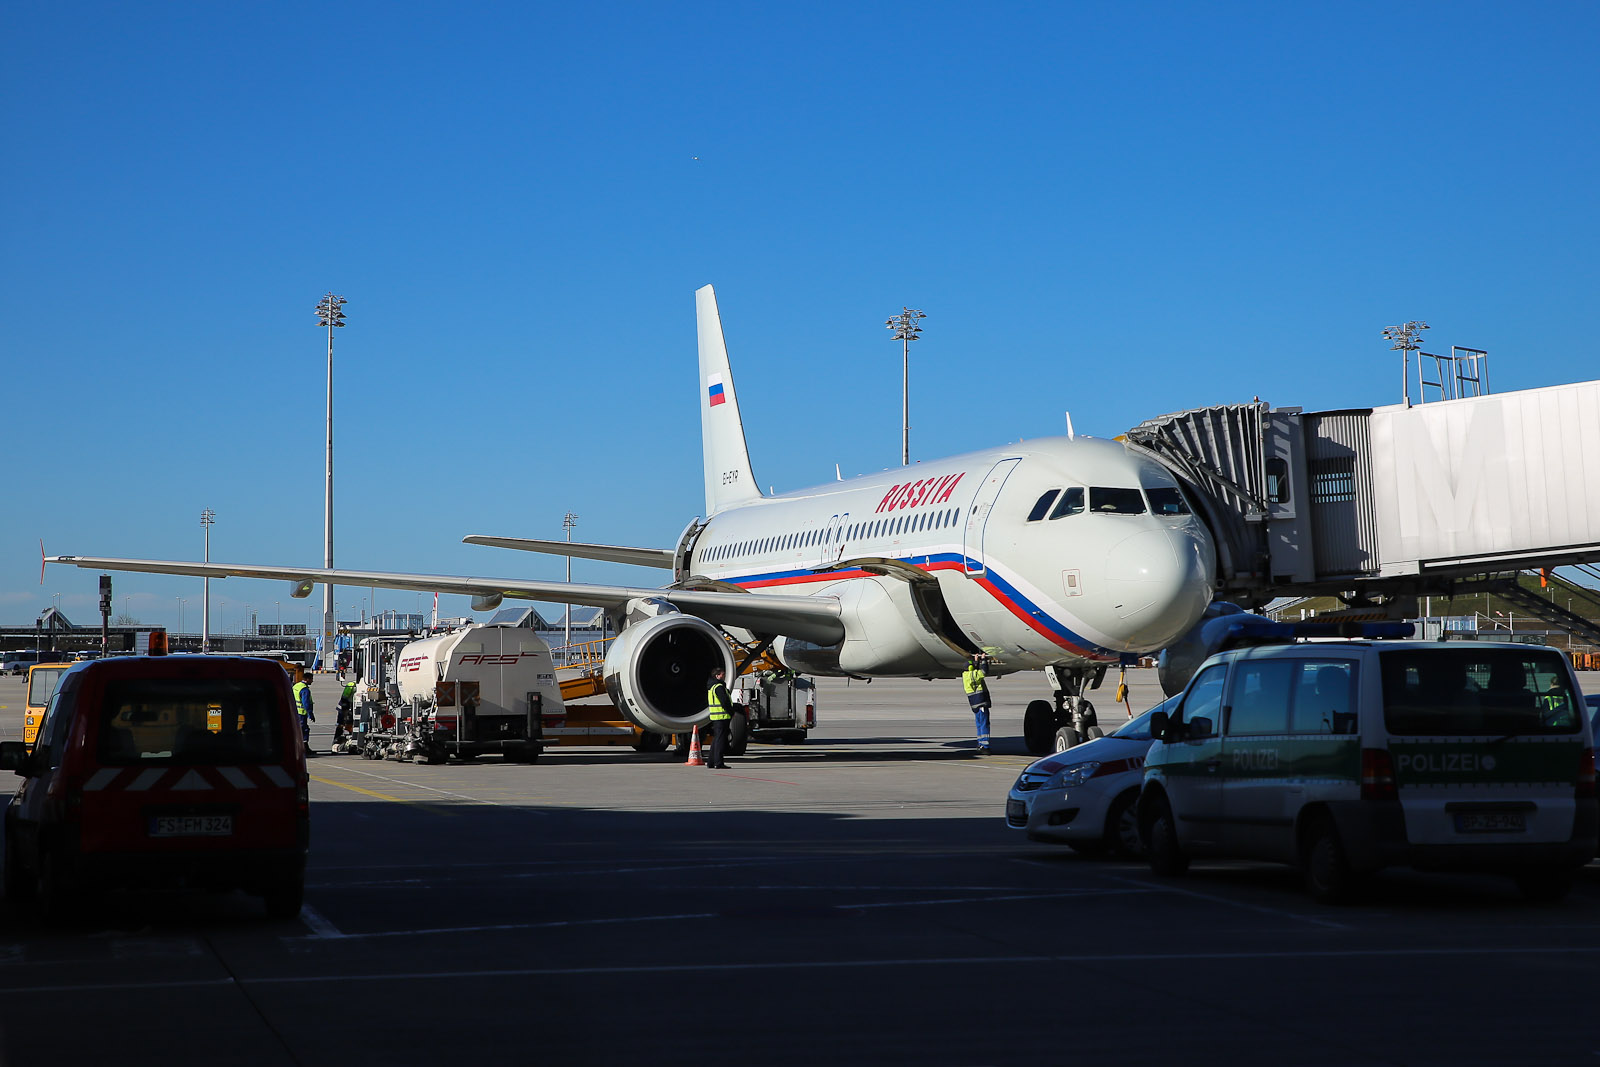 Airbus A320 авиакомпании Россия в аэропорту Мюнхена